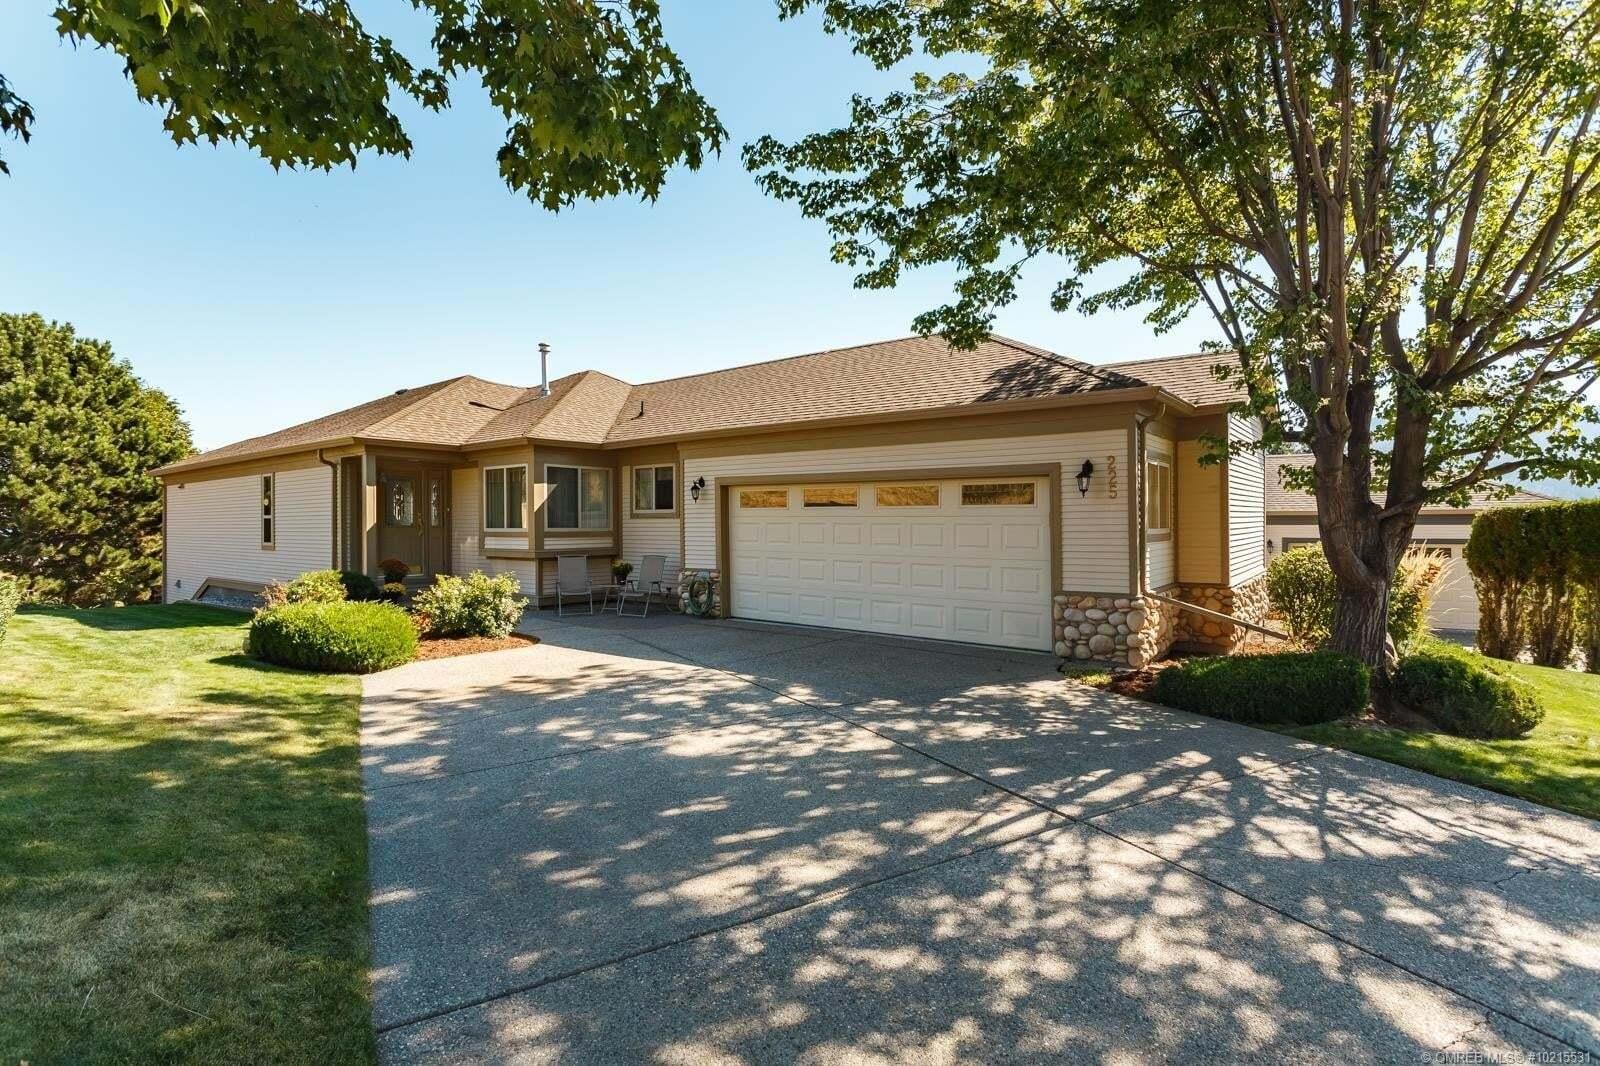 House for sale at 4074 Gellatly Rd Unit 225 West Kelowna British Columbia - MLS: 10215531